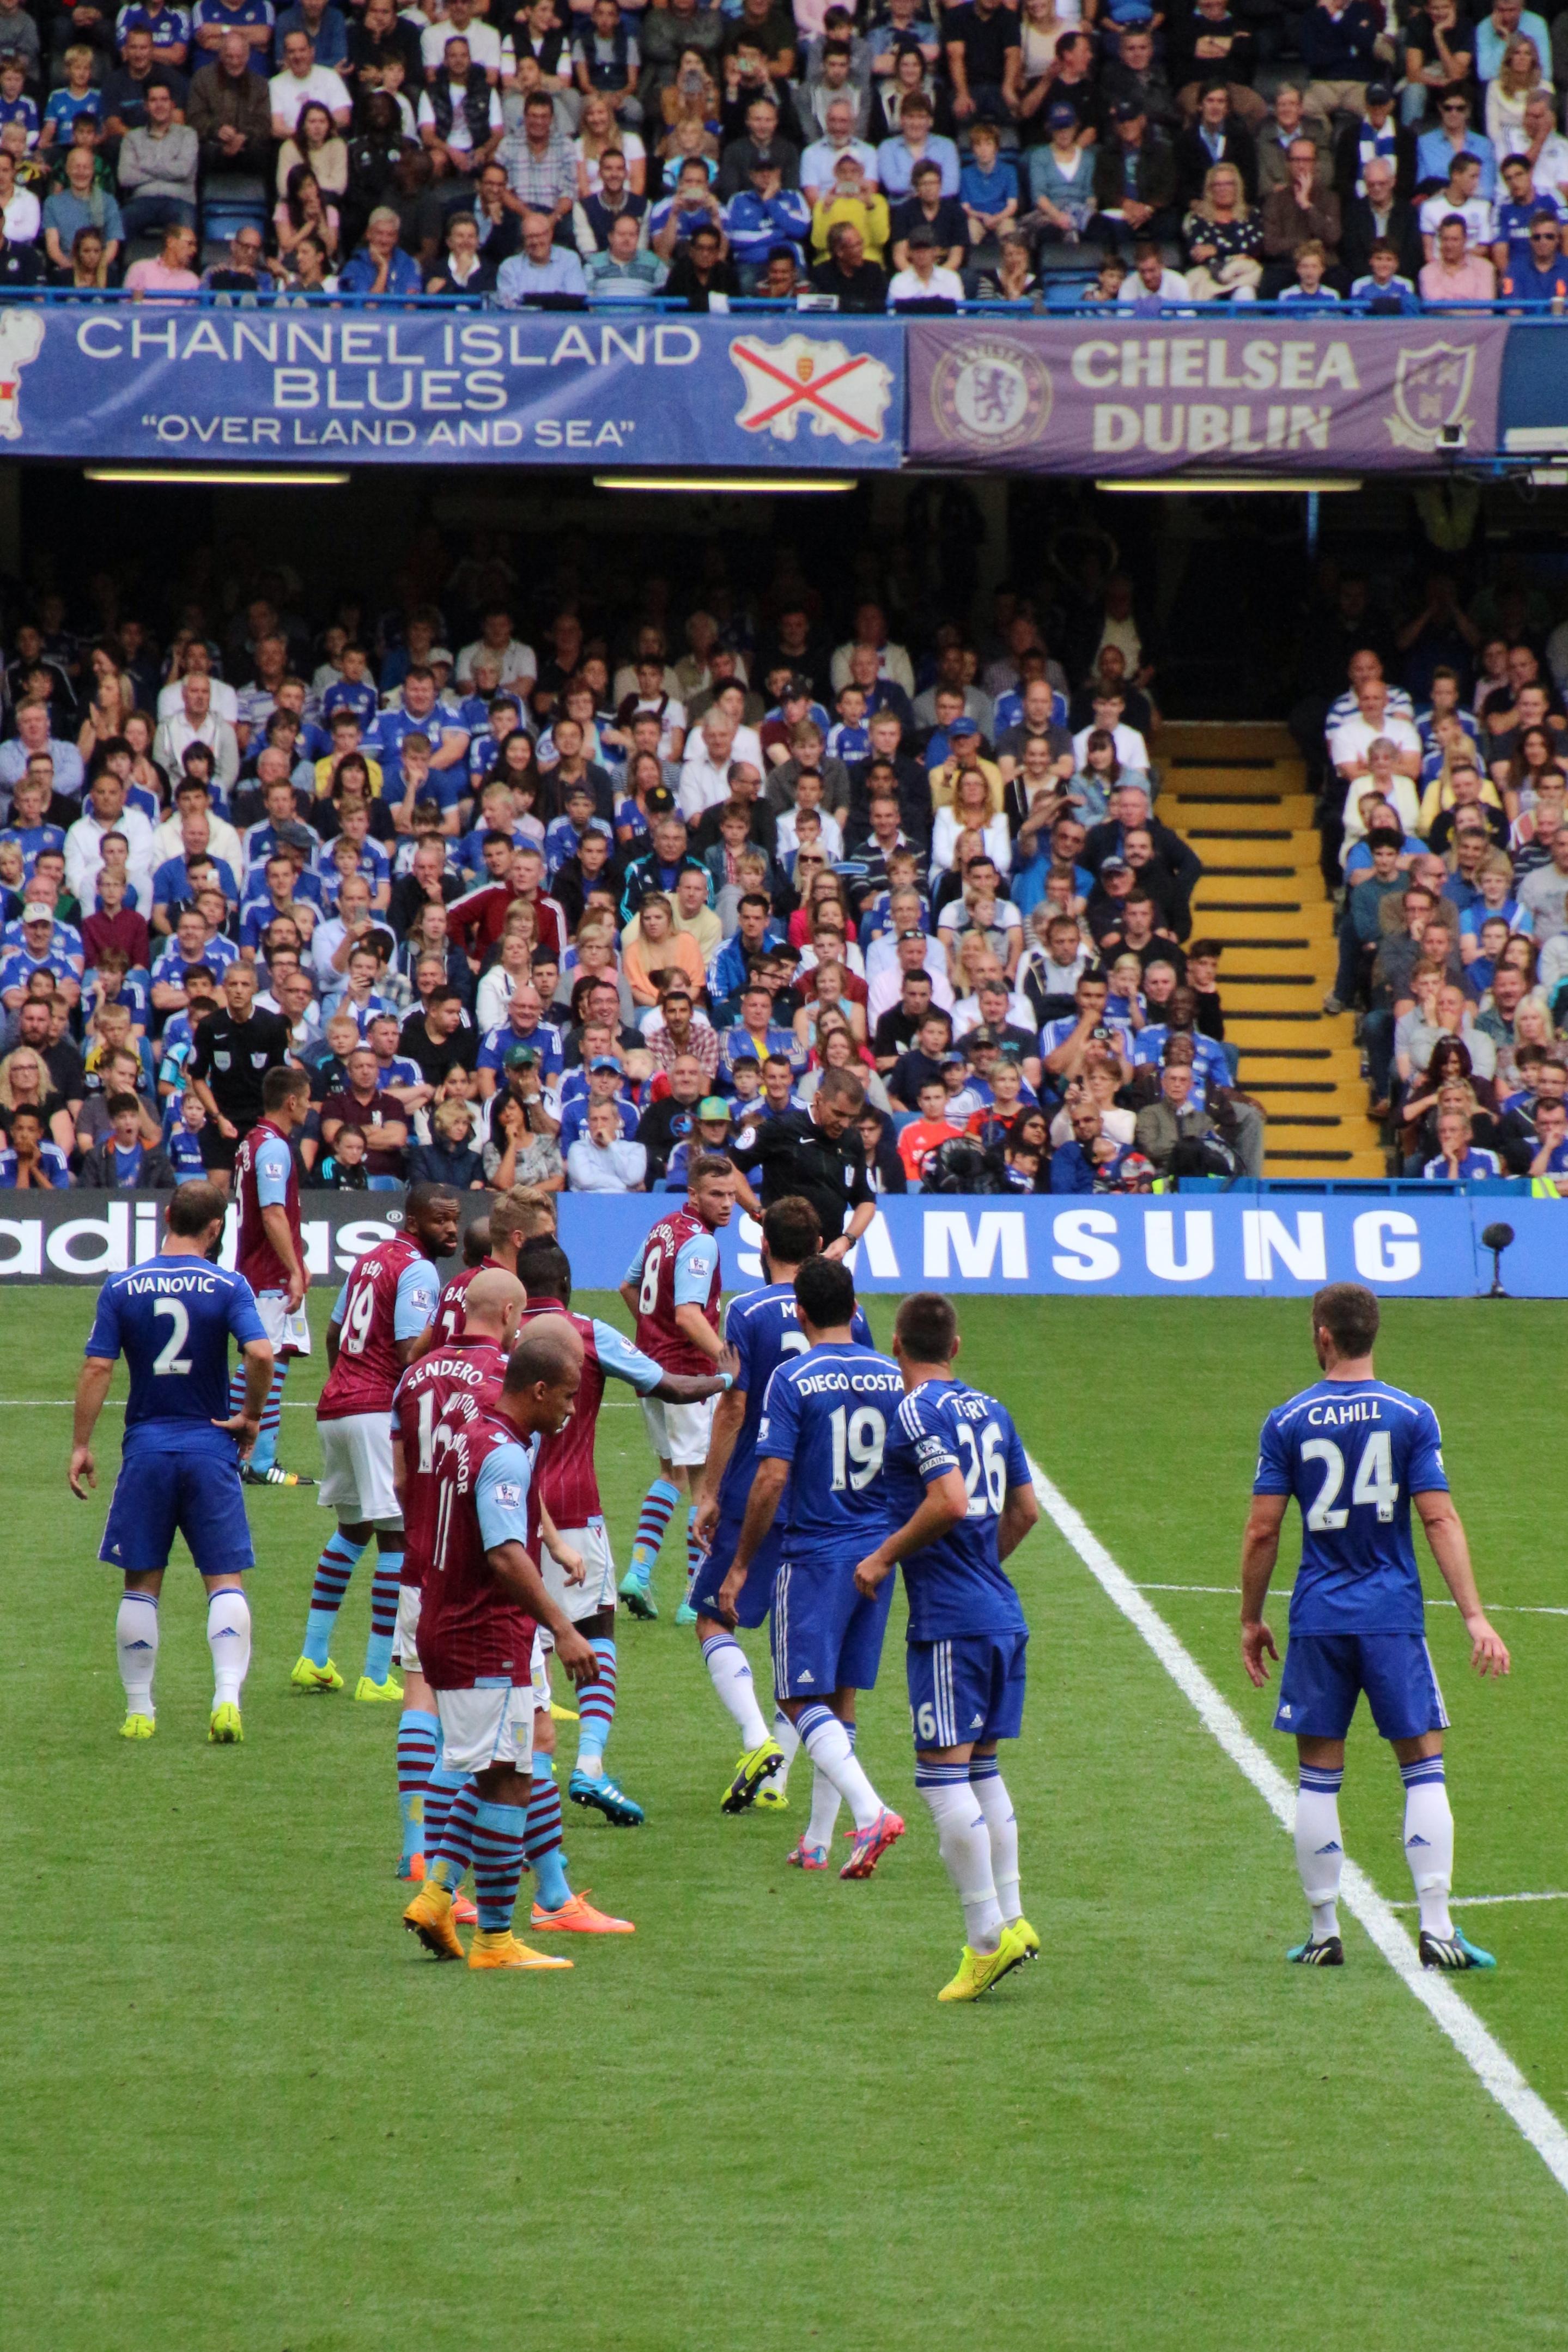 Aston Villa Match Free Parking